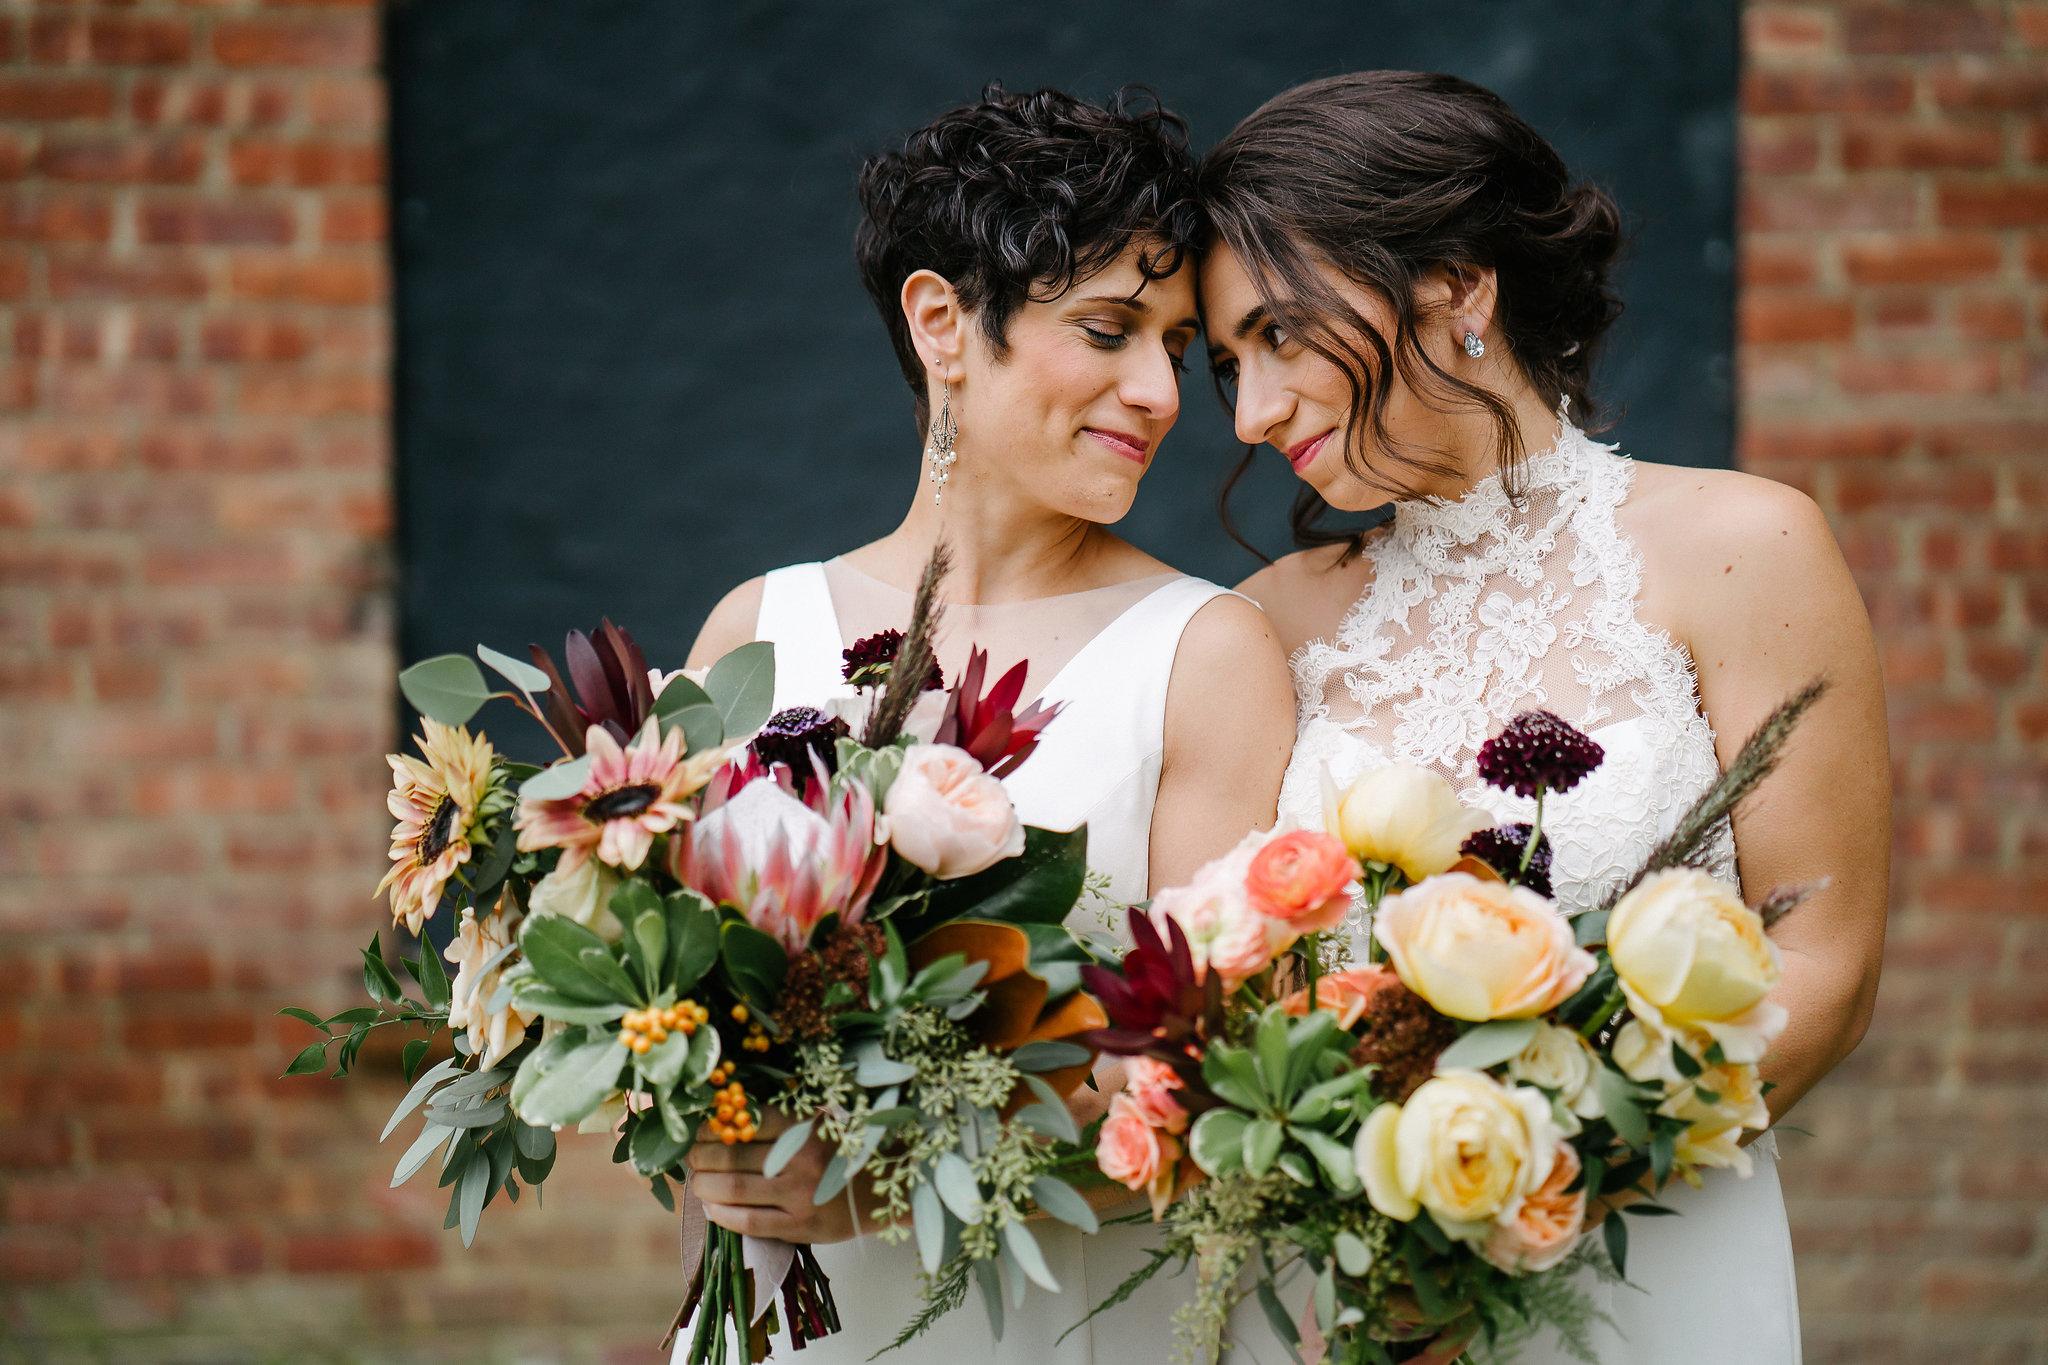 jess-elissa-wedding-145.jpg